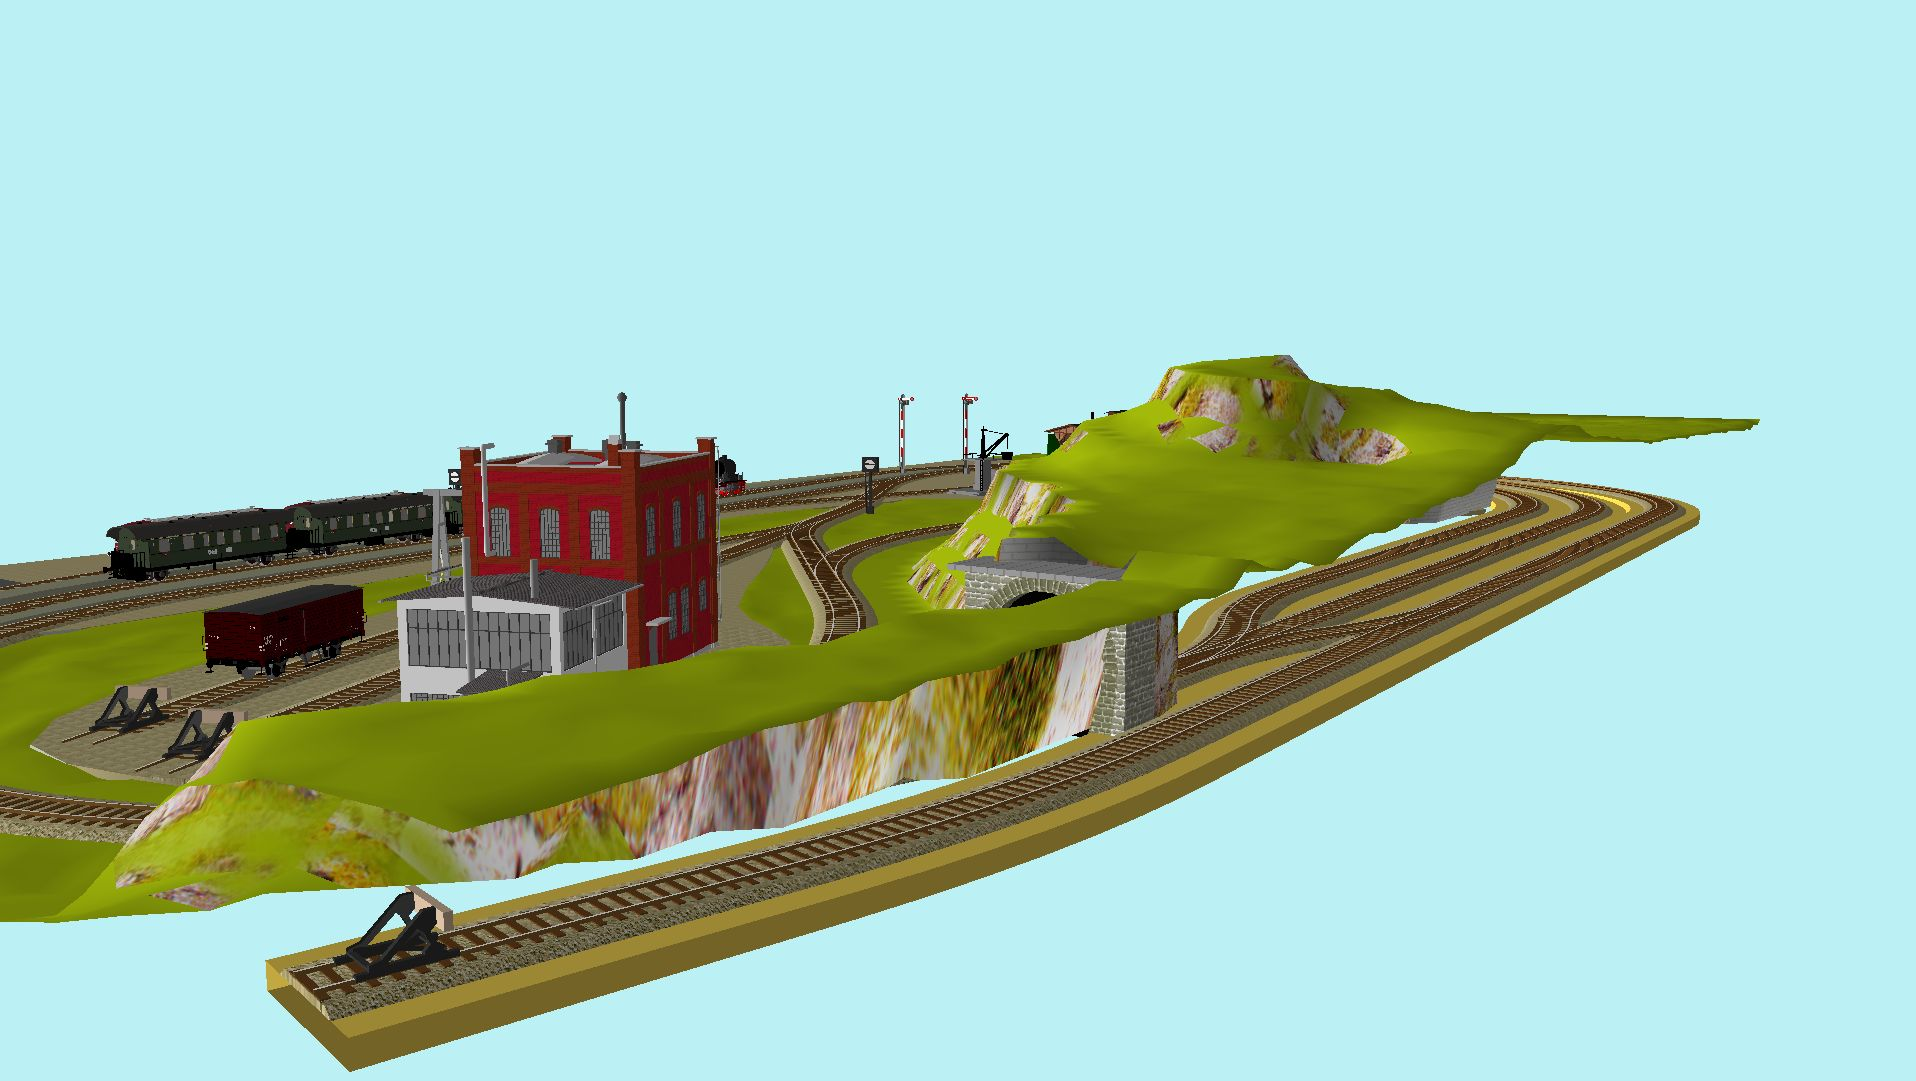 'ALBA Modellbahnpraxis' Band 1, Plan 5 Amp-1_5_k-gleis_sb_1gyj3o